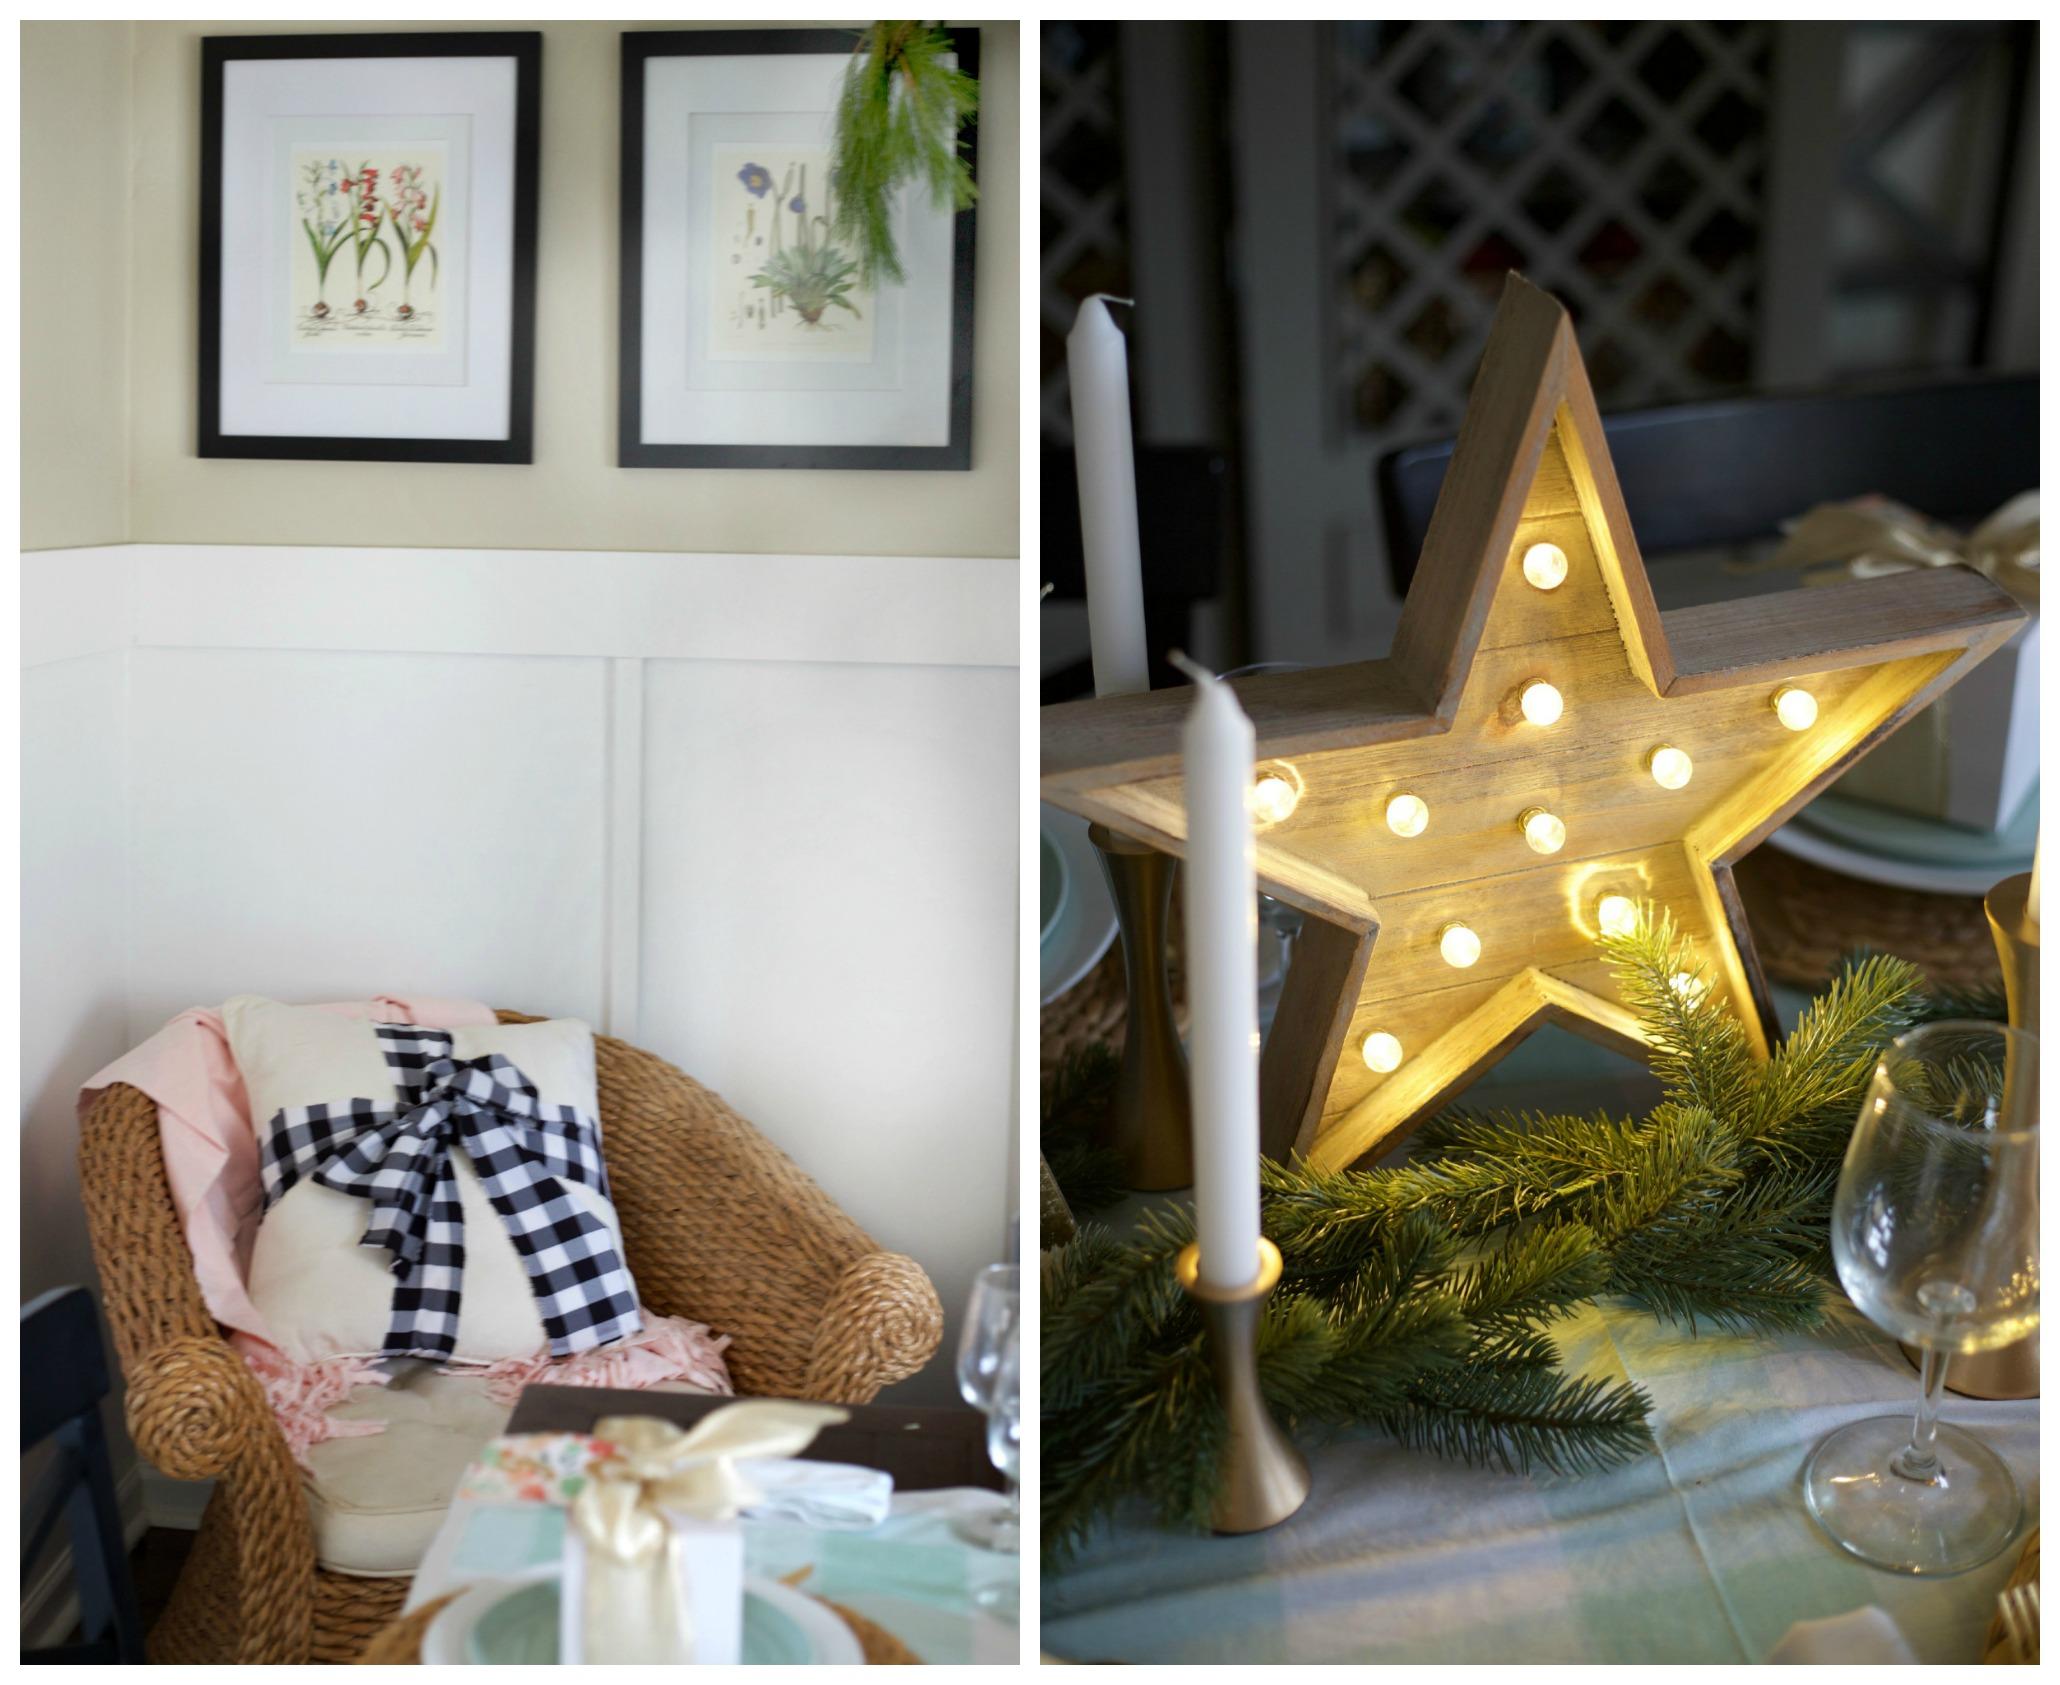 Easy Christmas Decorating Ideas | PartiesforPennies.com | Budget Friendly | Easy Christmas Pillow Idea | Light-Up Star Centerpiece